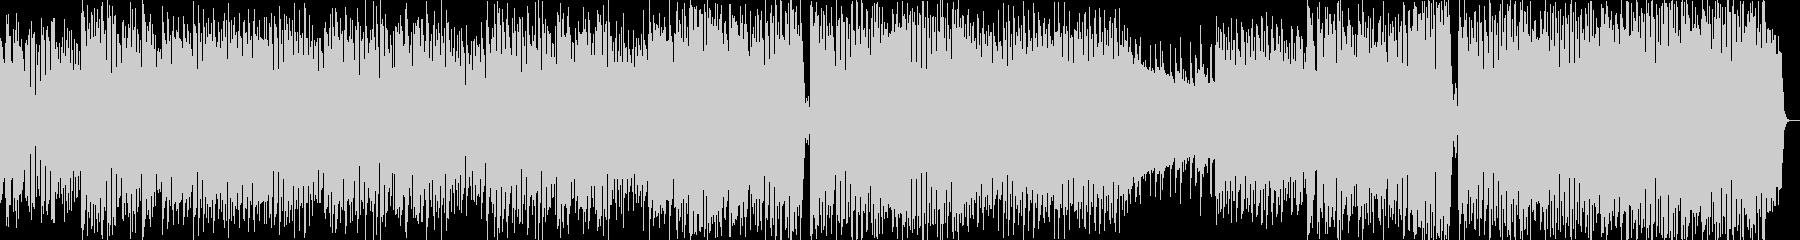 8bit風の和メロテクノポップスの未再生の波形